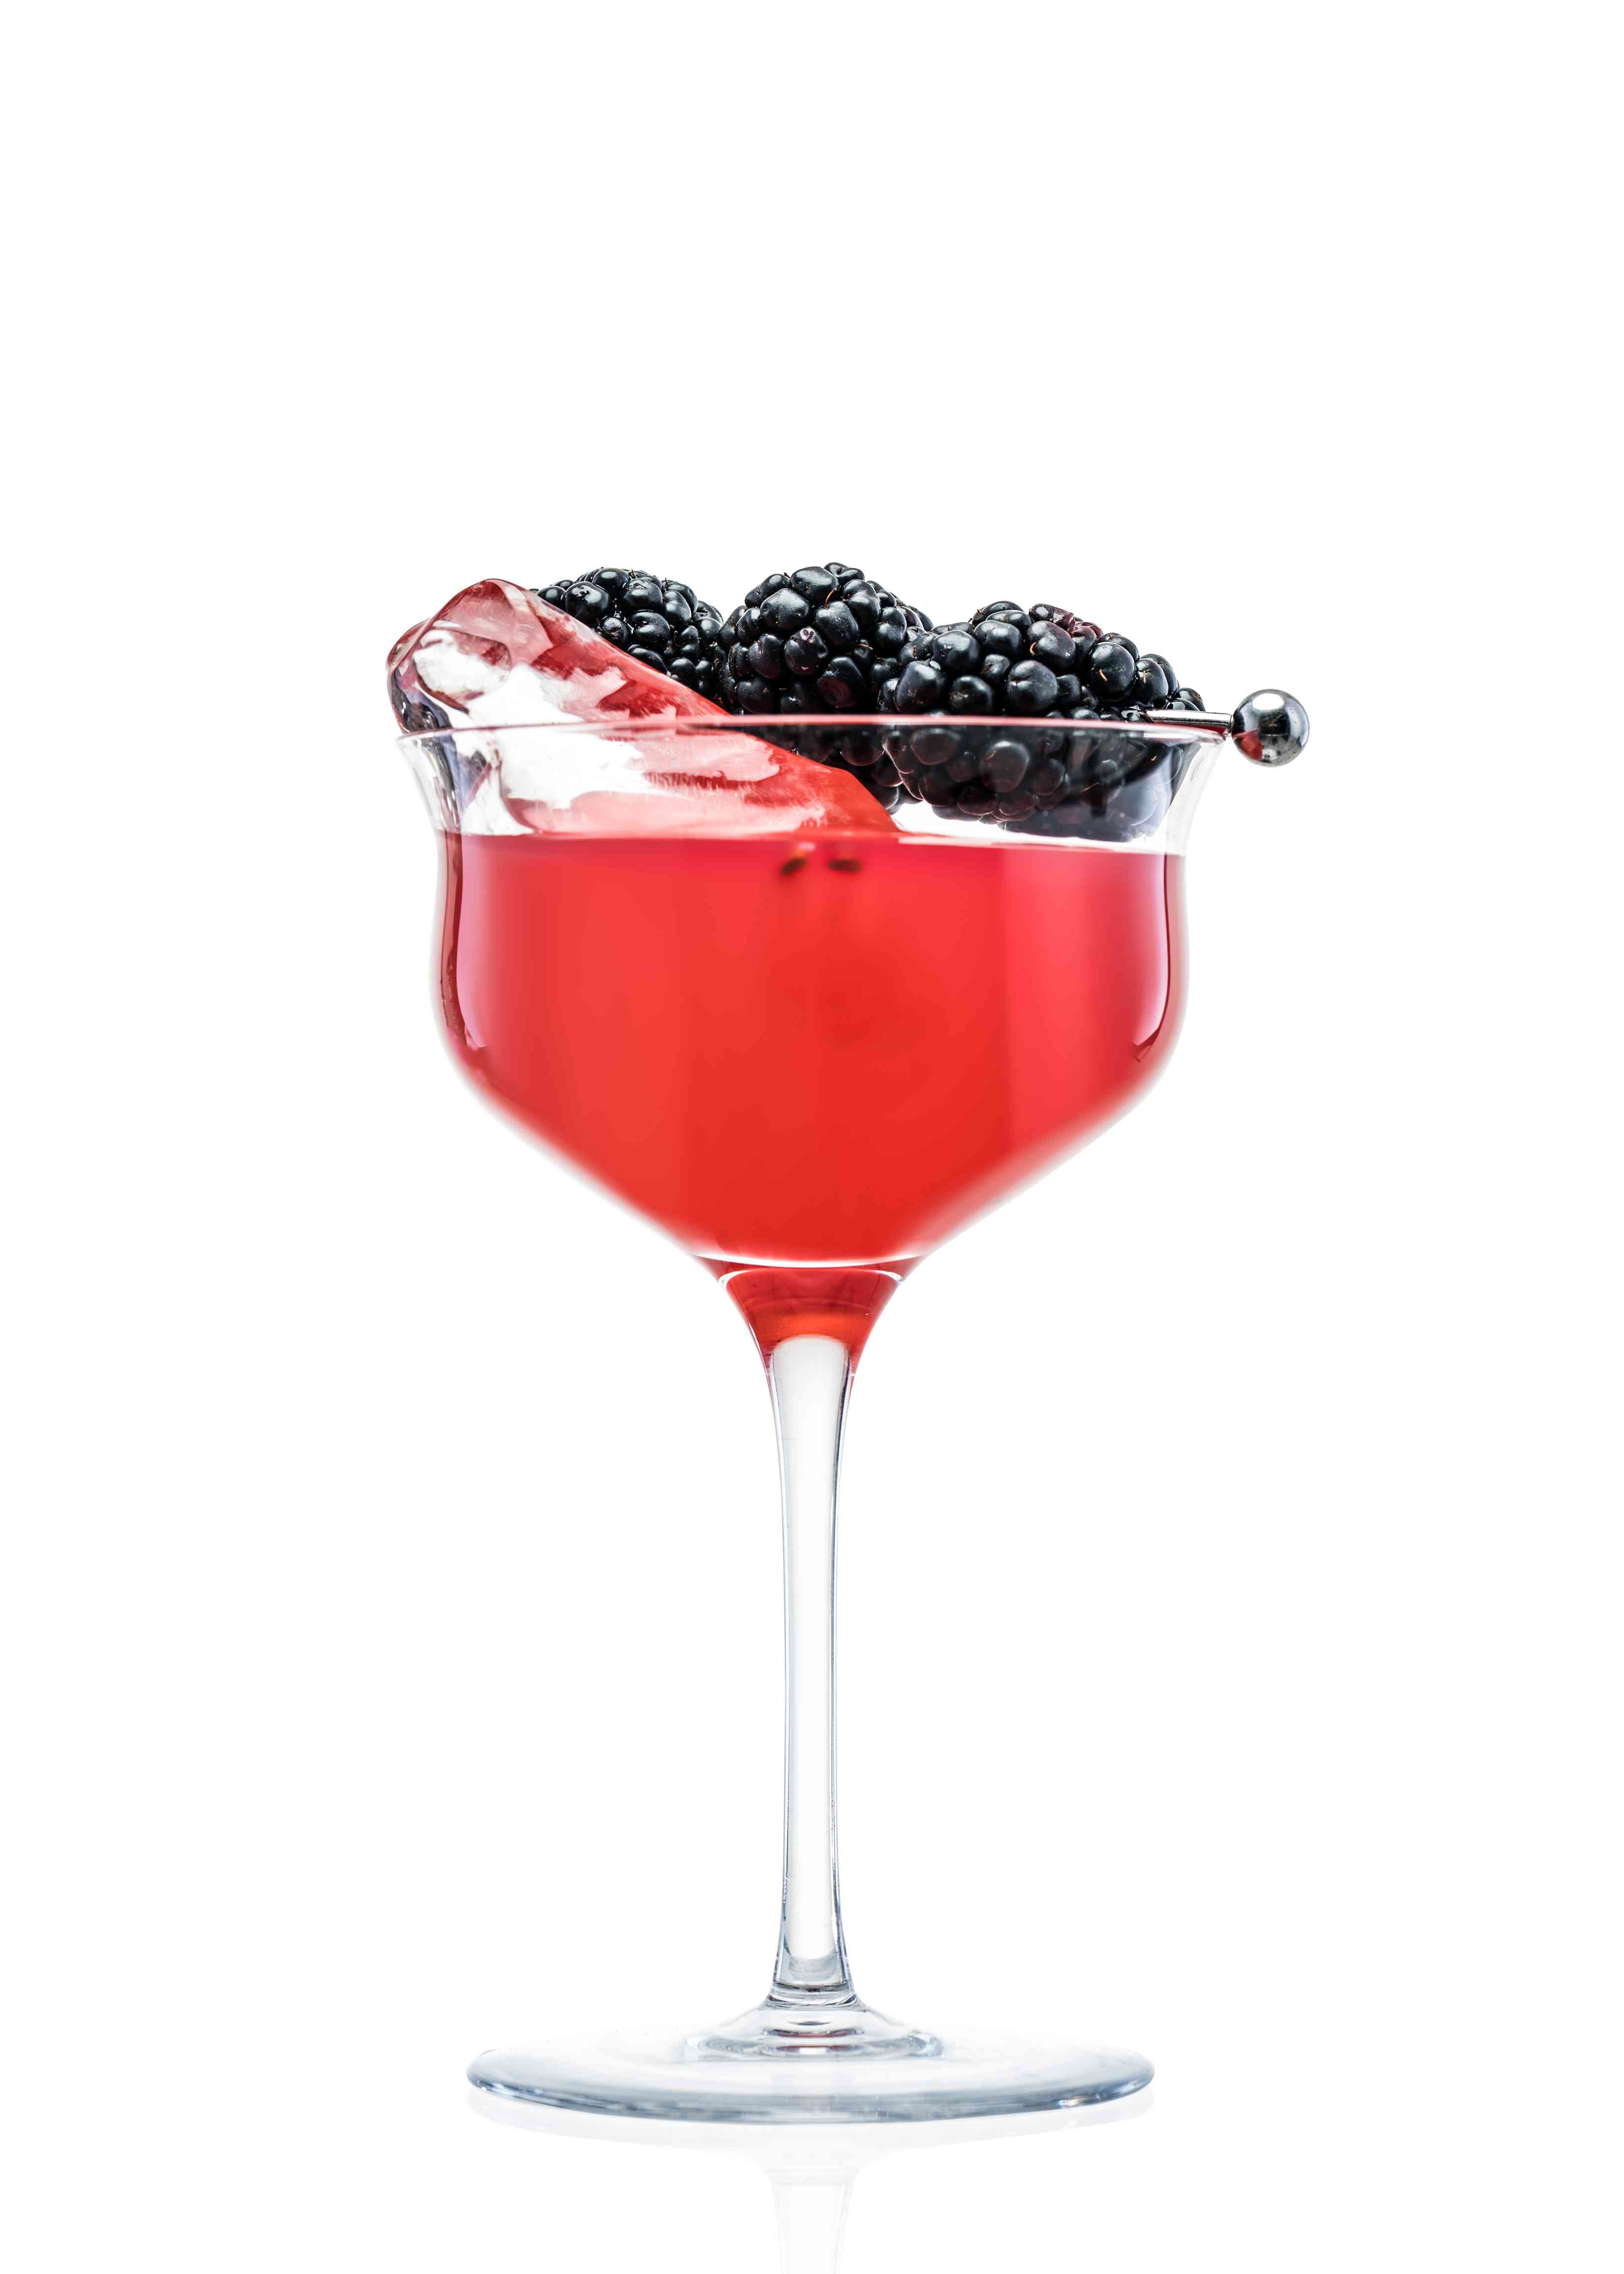 alcohol, signature cocktails, drink, glass, blackberry, garnish, mezcal